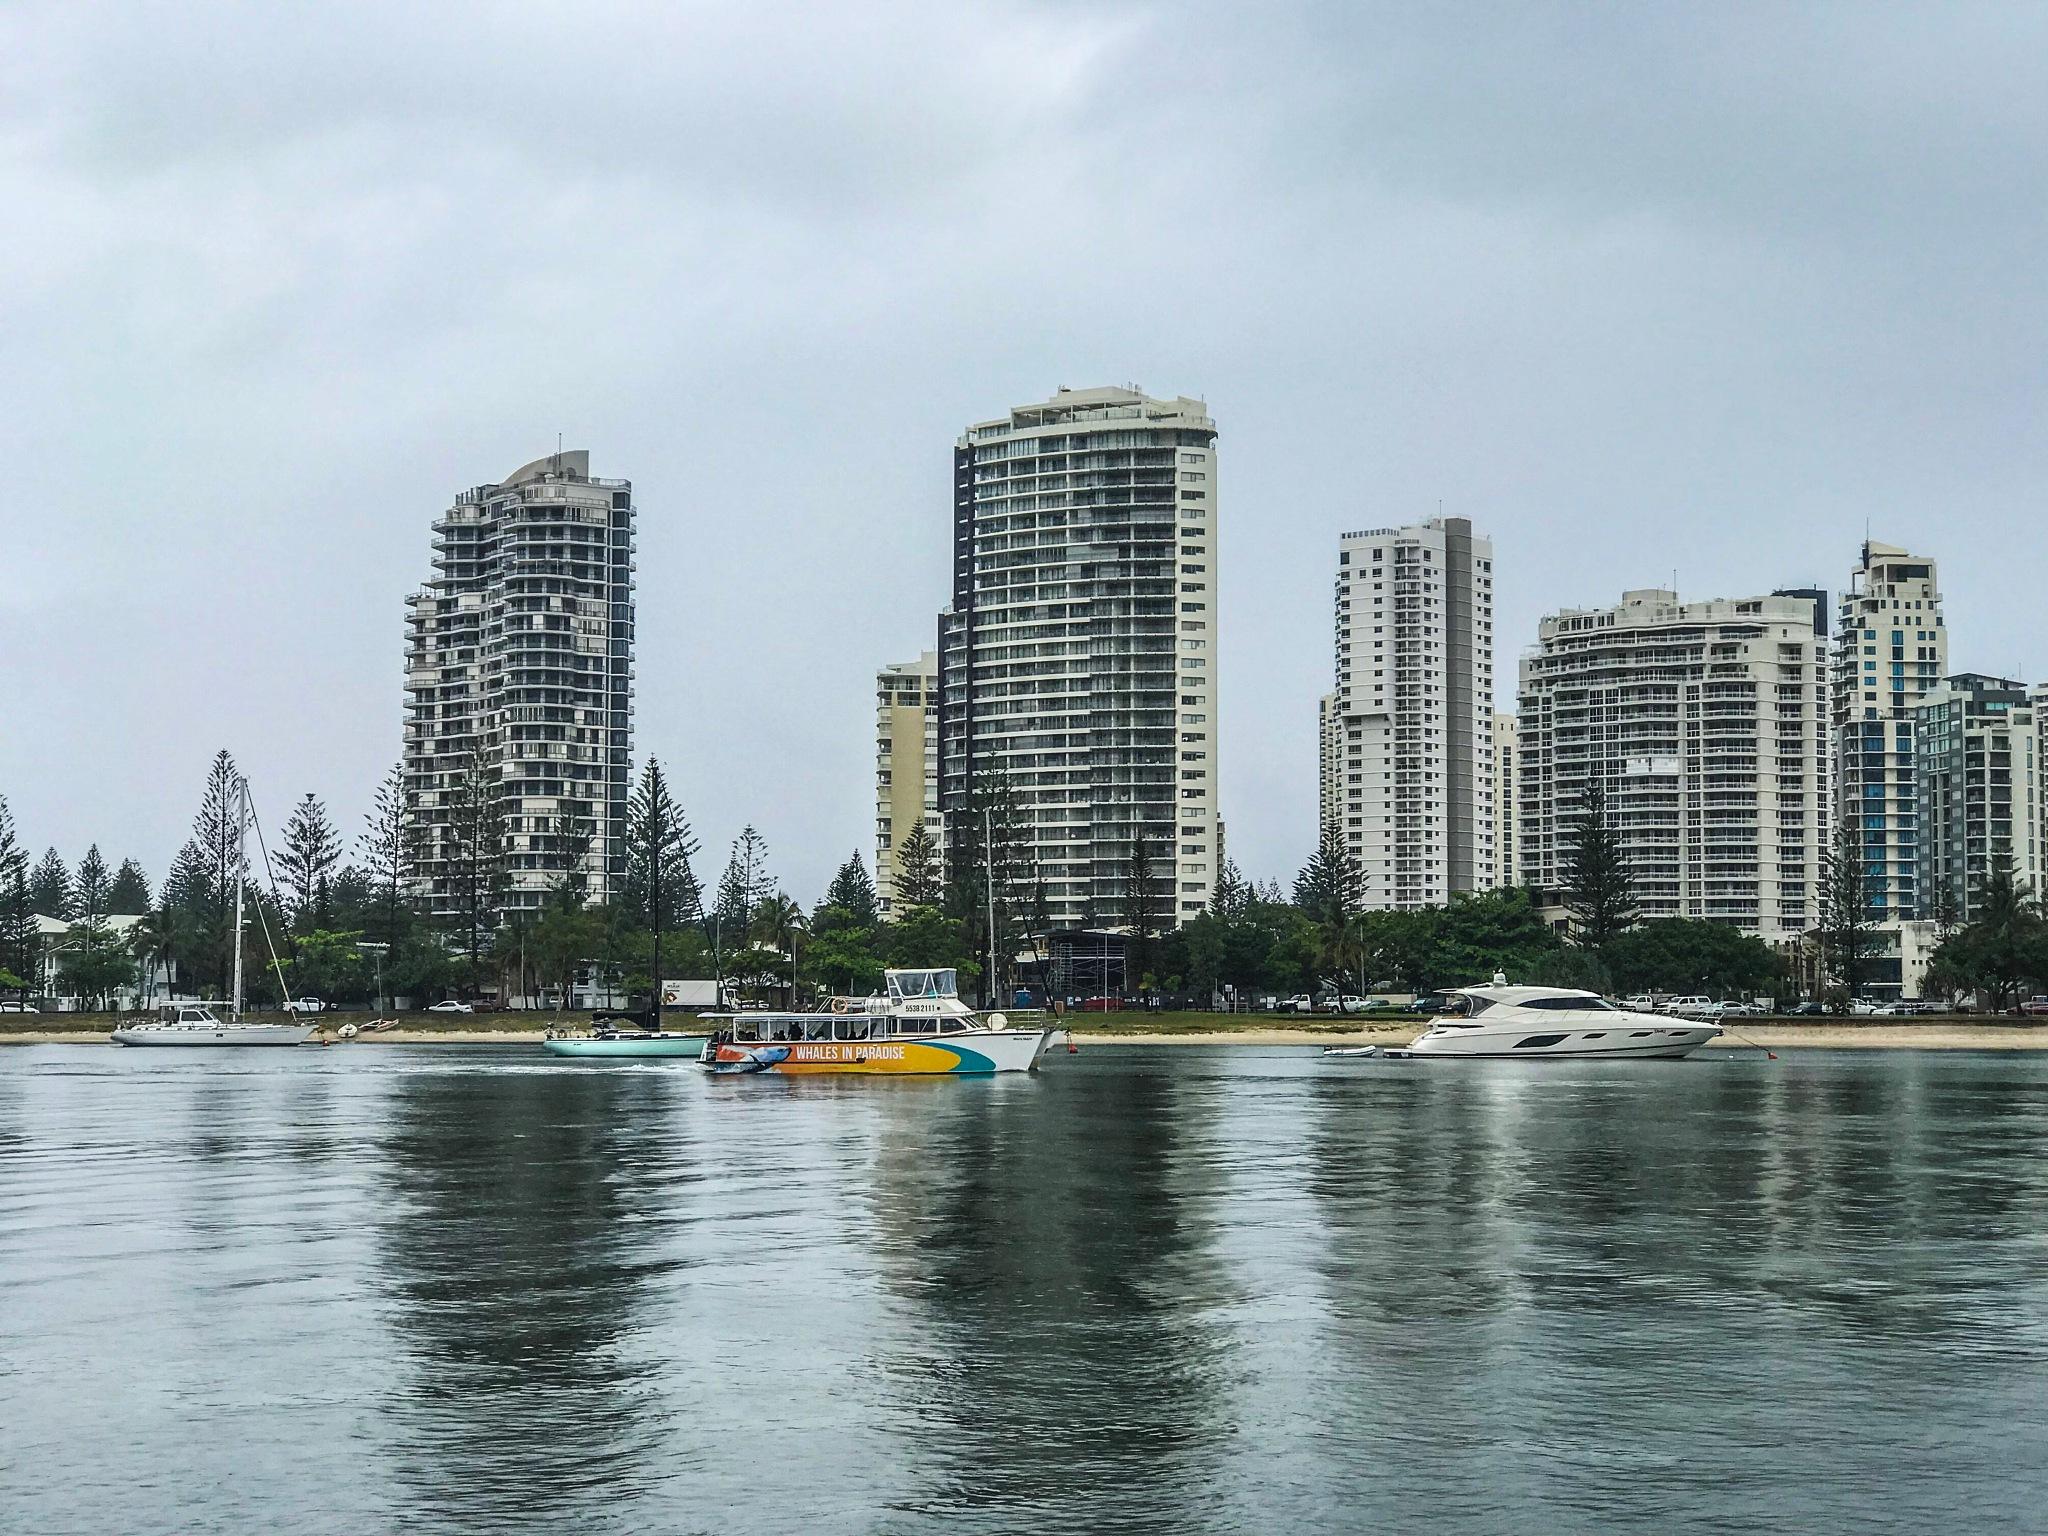 Gold Coast by Daz Laughton